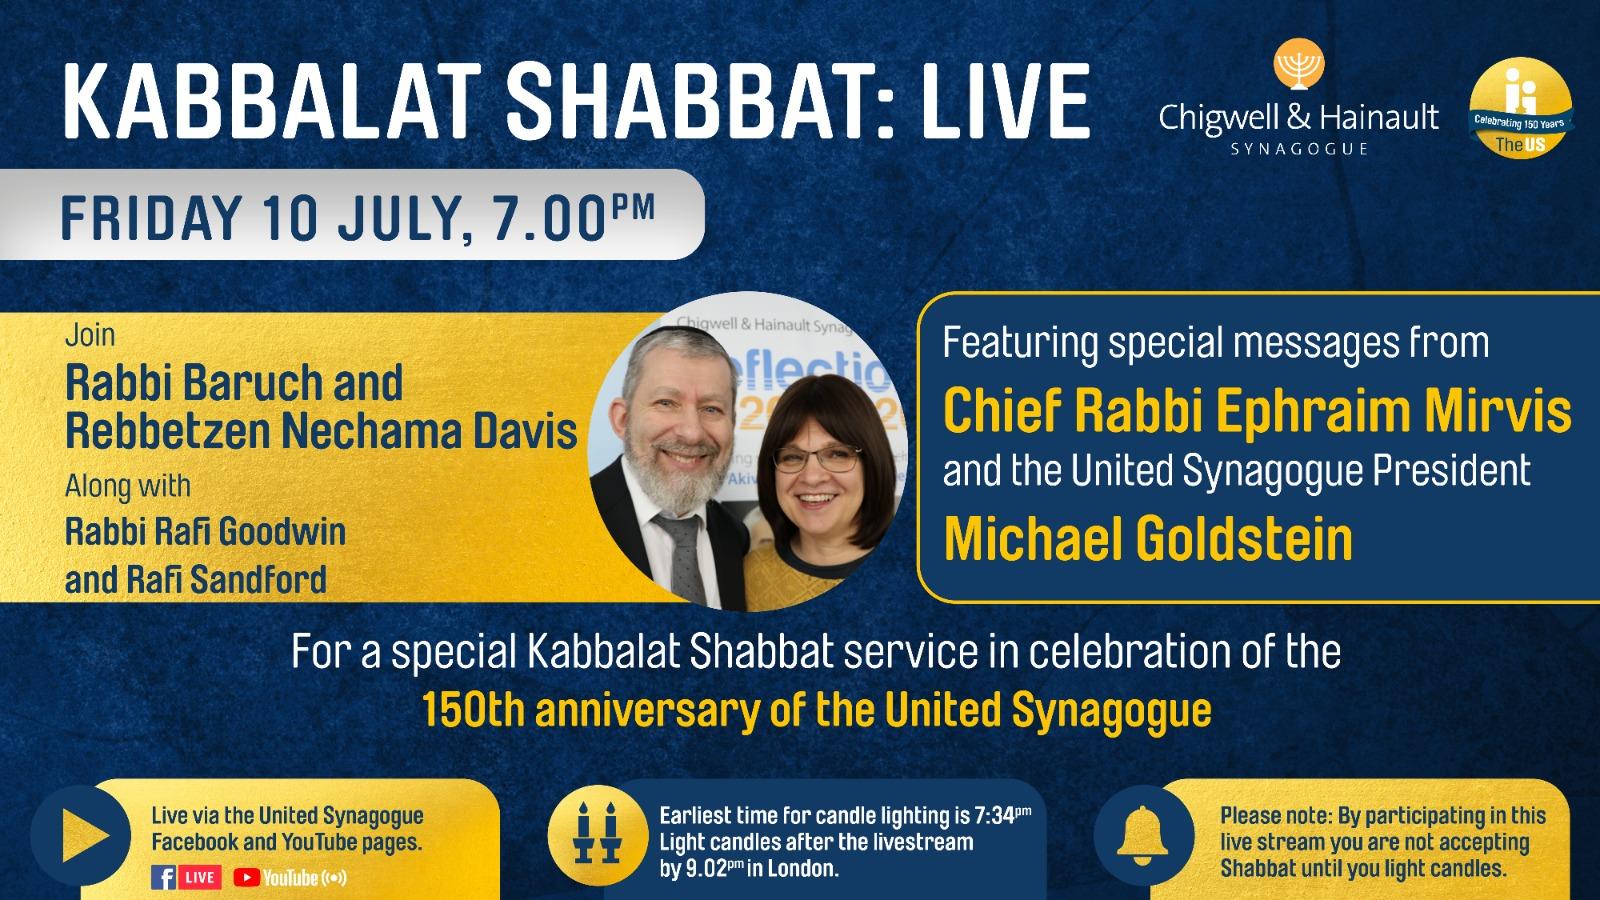 image of Kabbalat Shabbat this Friday